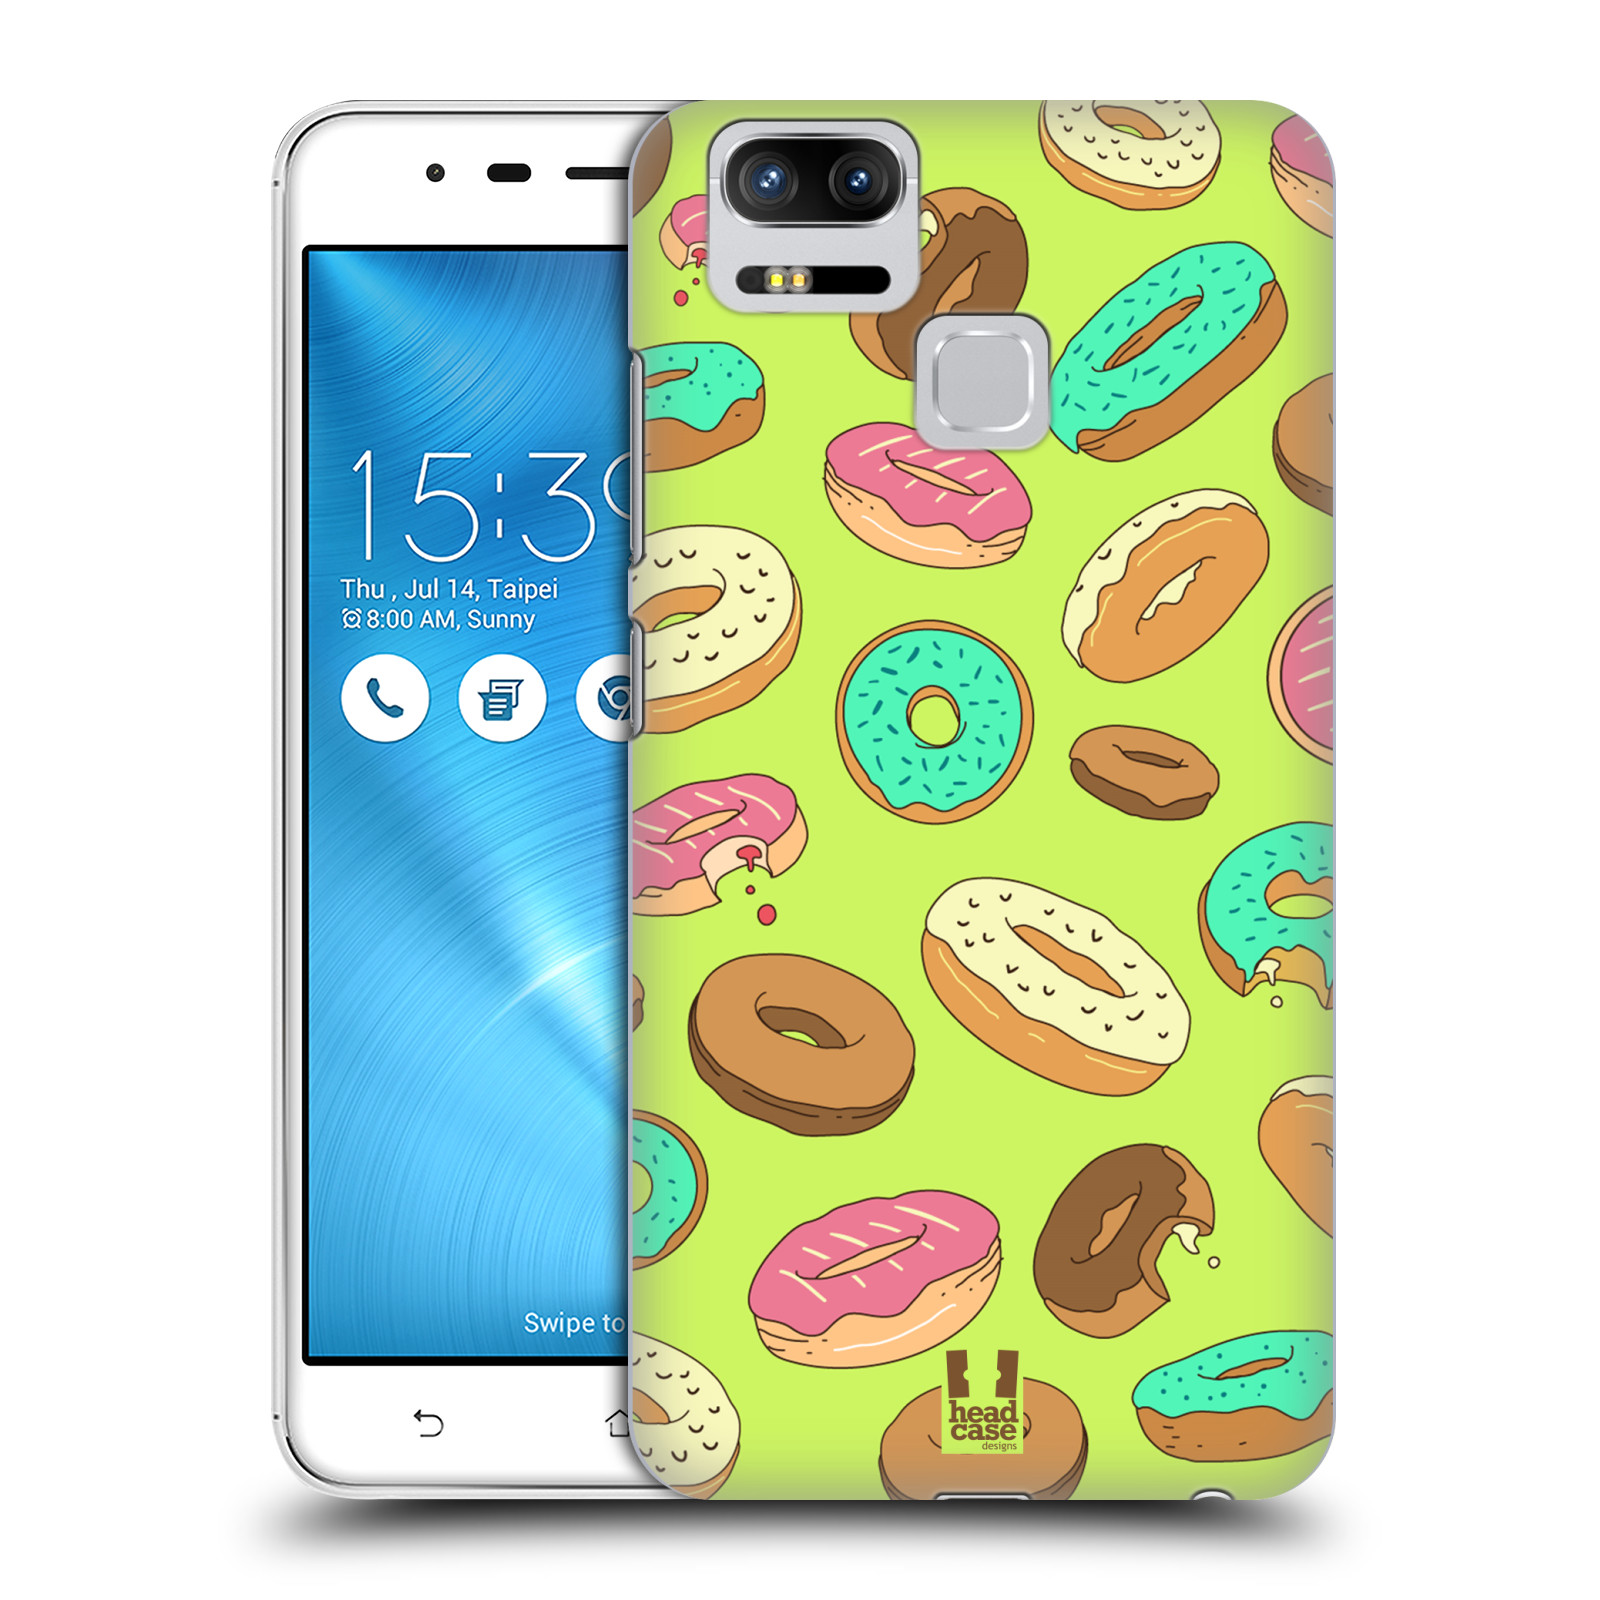 Plastové pouzdro na mobil Asus ZenFone 3 ZOOM ZE553KL - Head Case - DONUTKY (Plastový kryt či obal na mobilní telefon Asus ZenFone 3 ZOOM ZE553KL s motivem DONUTKY )